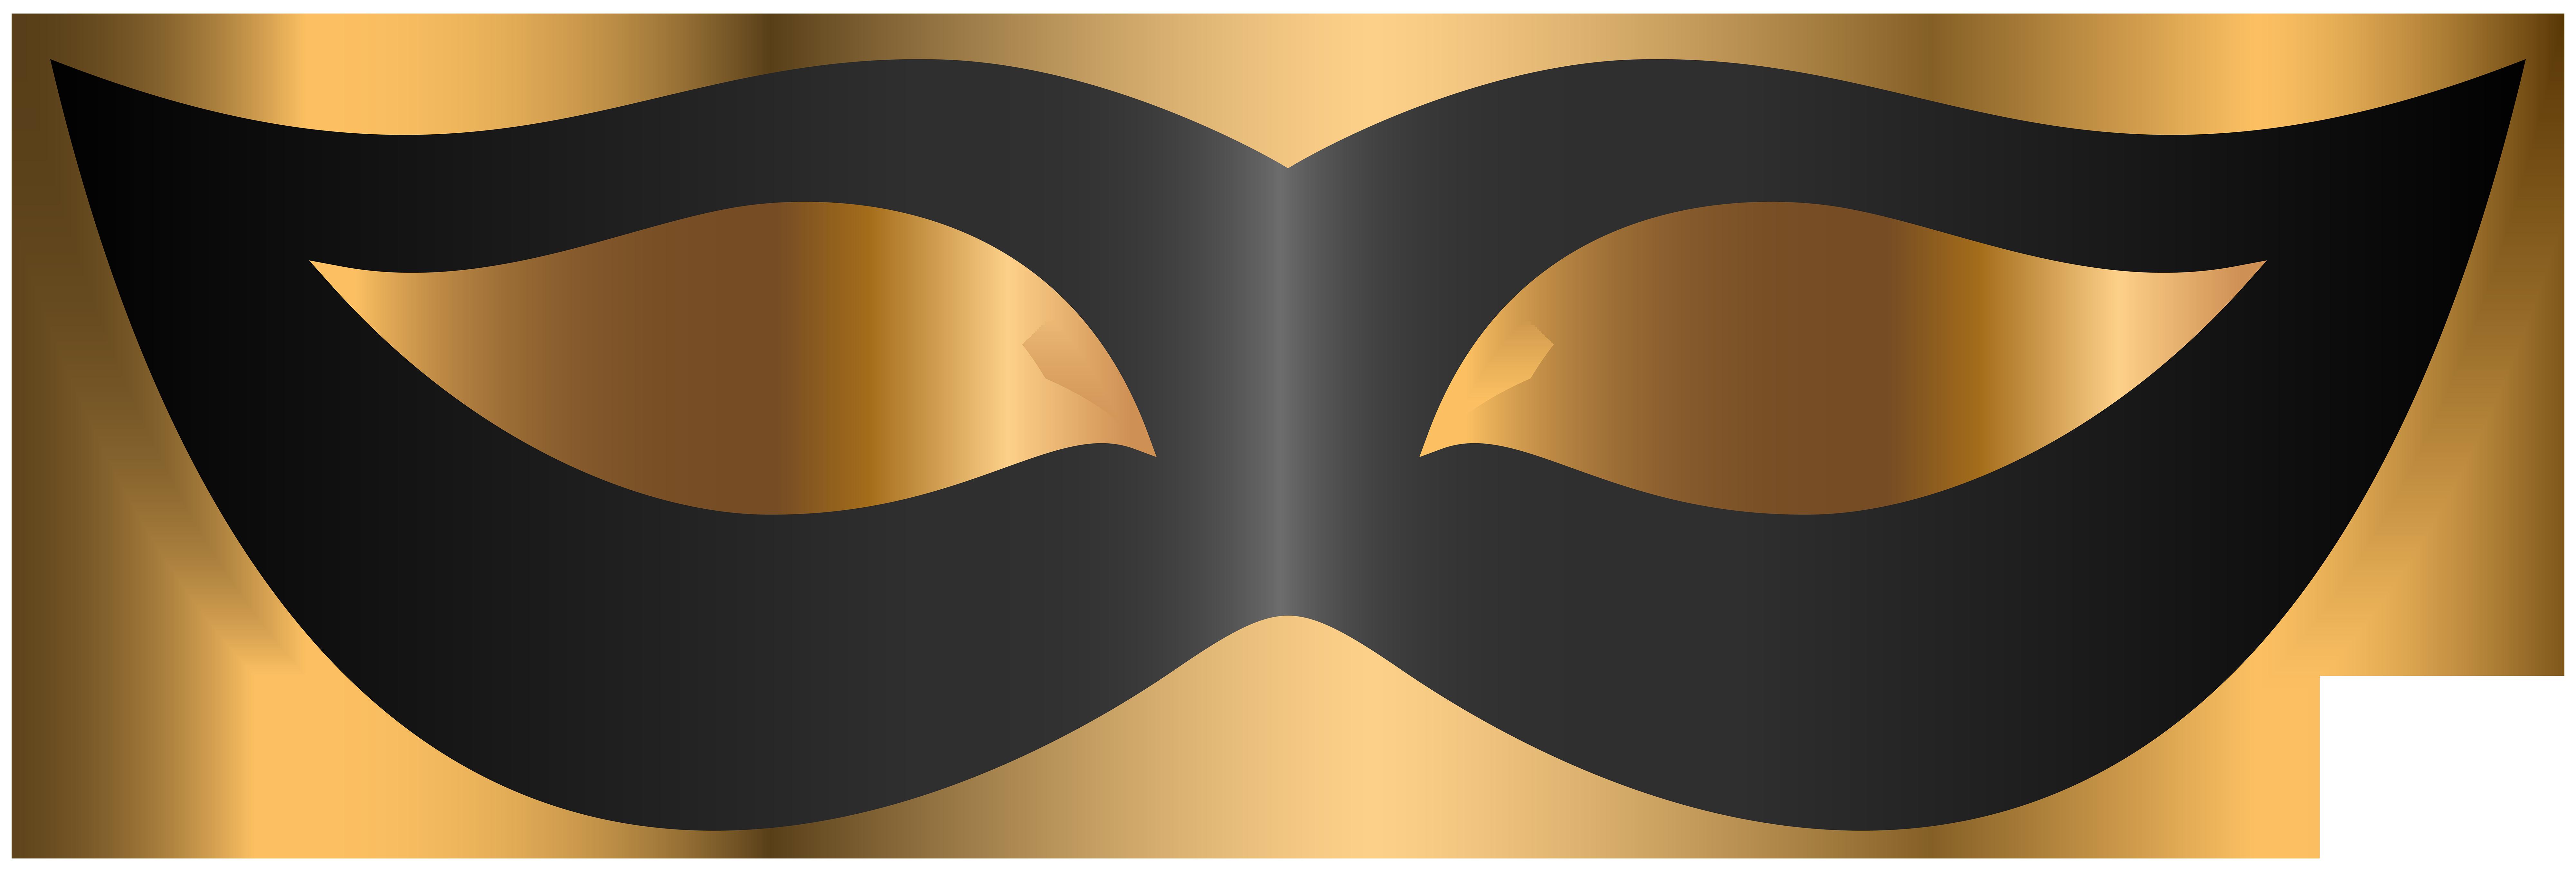 Carnival clipart transparent. Black mask png clip